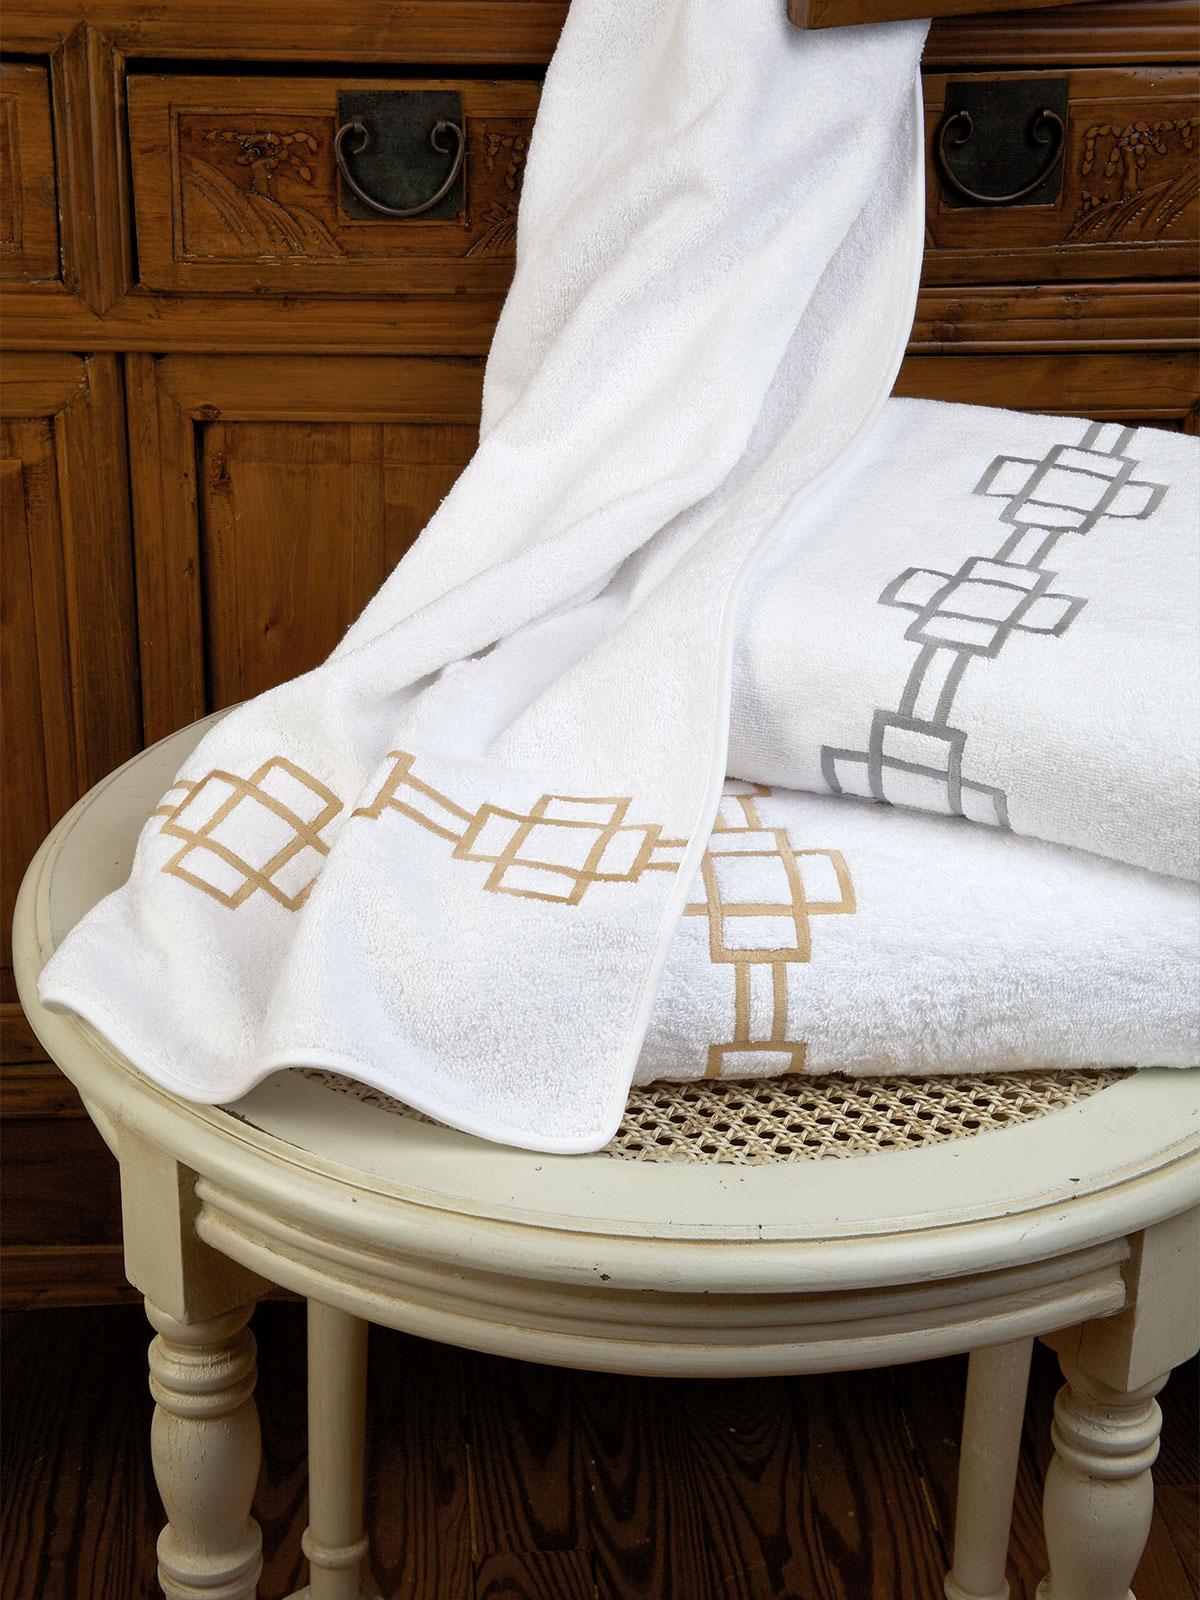 27a4aed7cd Knightsbridge Towels. Knightsbridge Twls 1287.jpg. Knightsbridge Towels